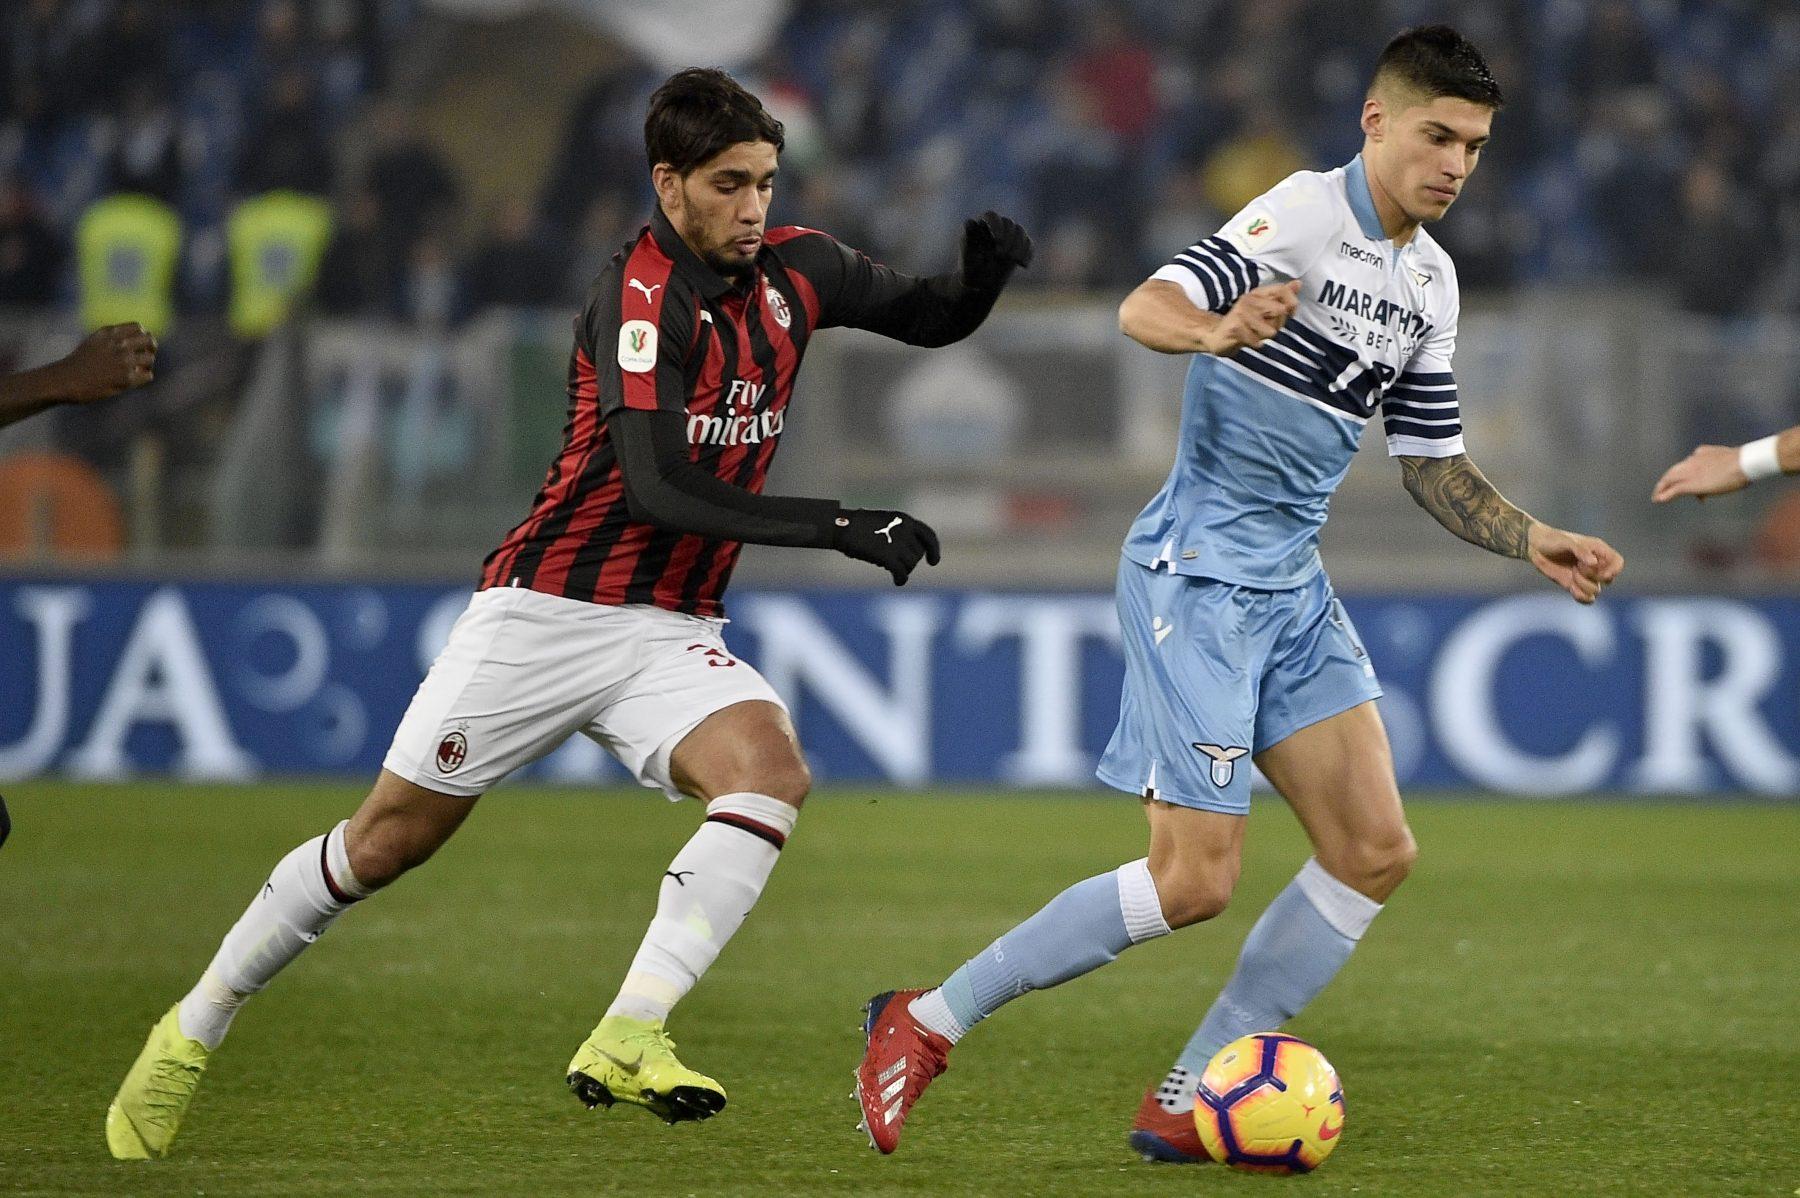 Romano: AC Milan had €40m ready for Correa; Lazio respecting the promise - SempreMilan